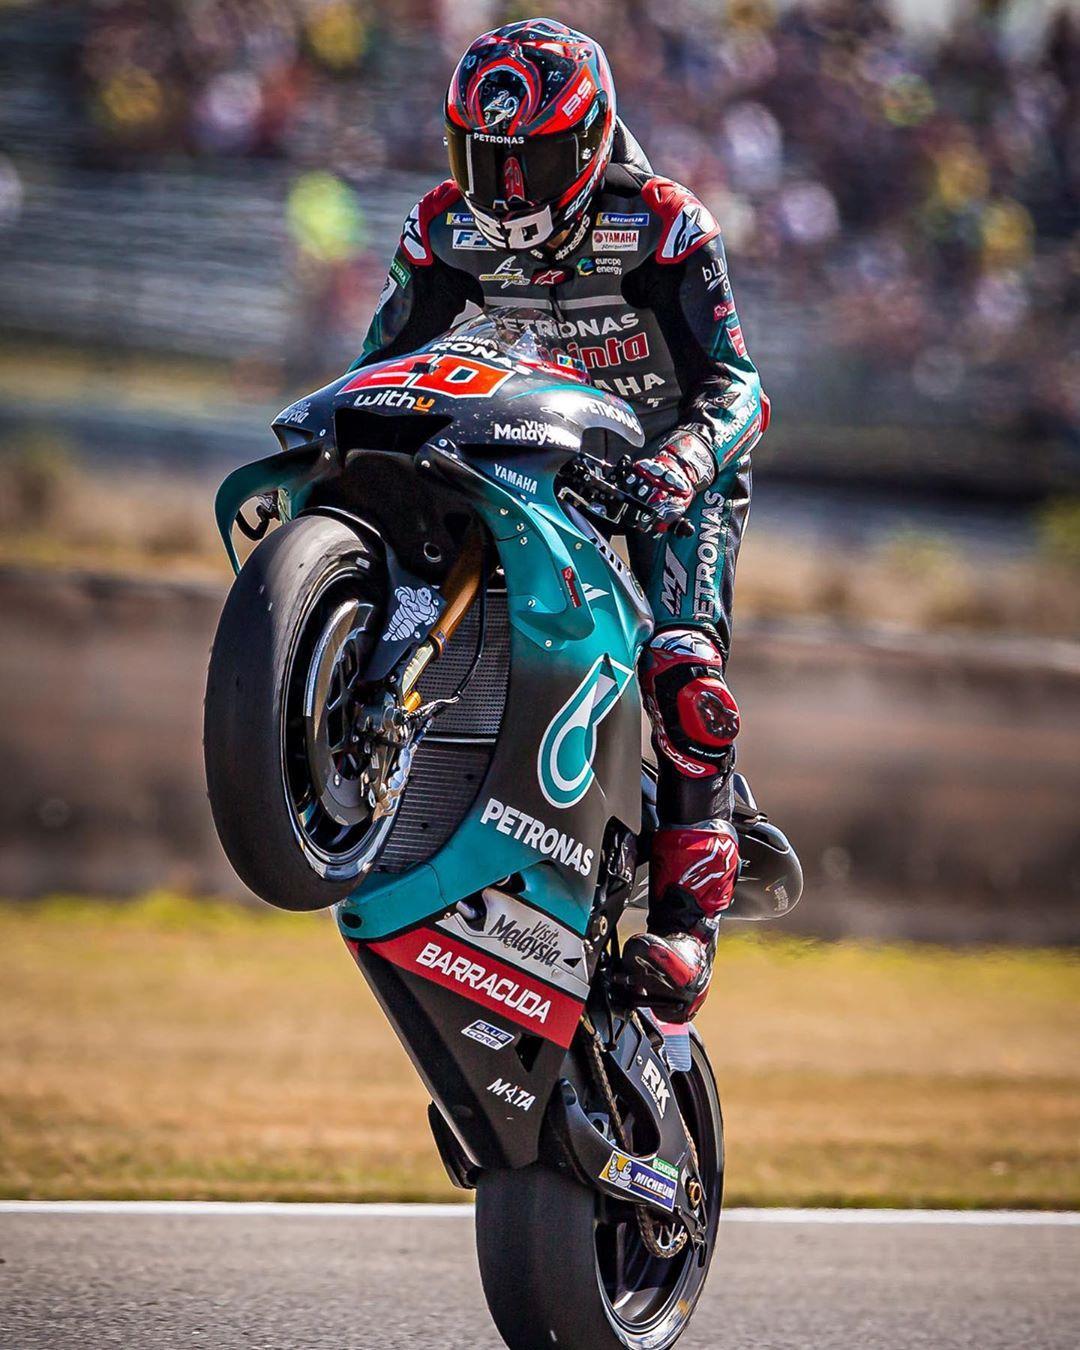 Fabio Quartararo On Instagram In 2020 Racing Motorcycles Racing Bikes Supermoto